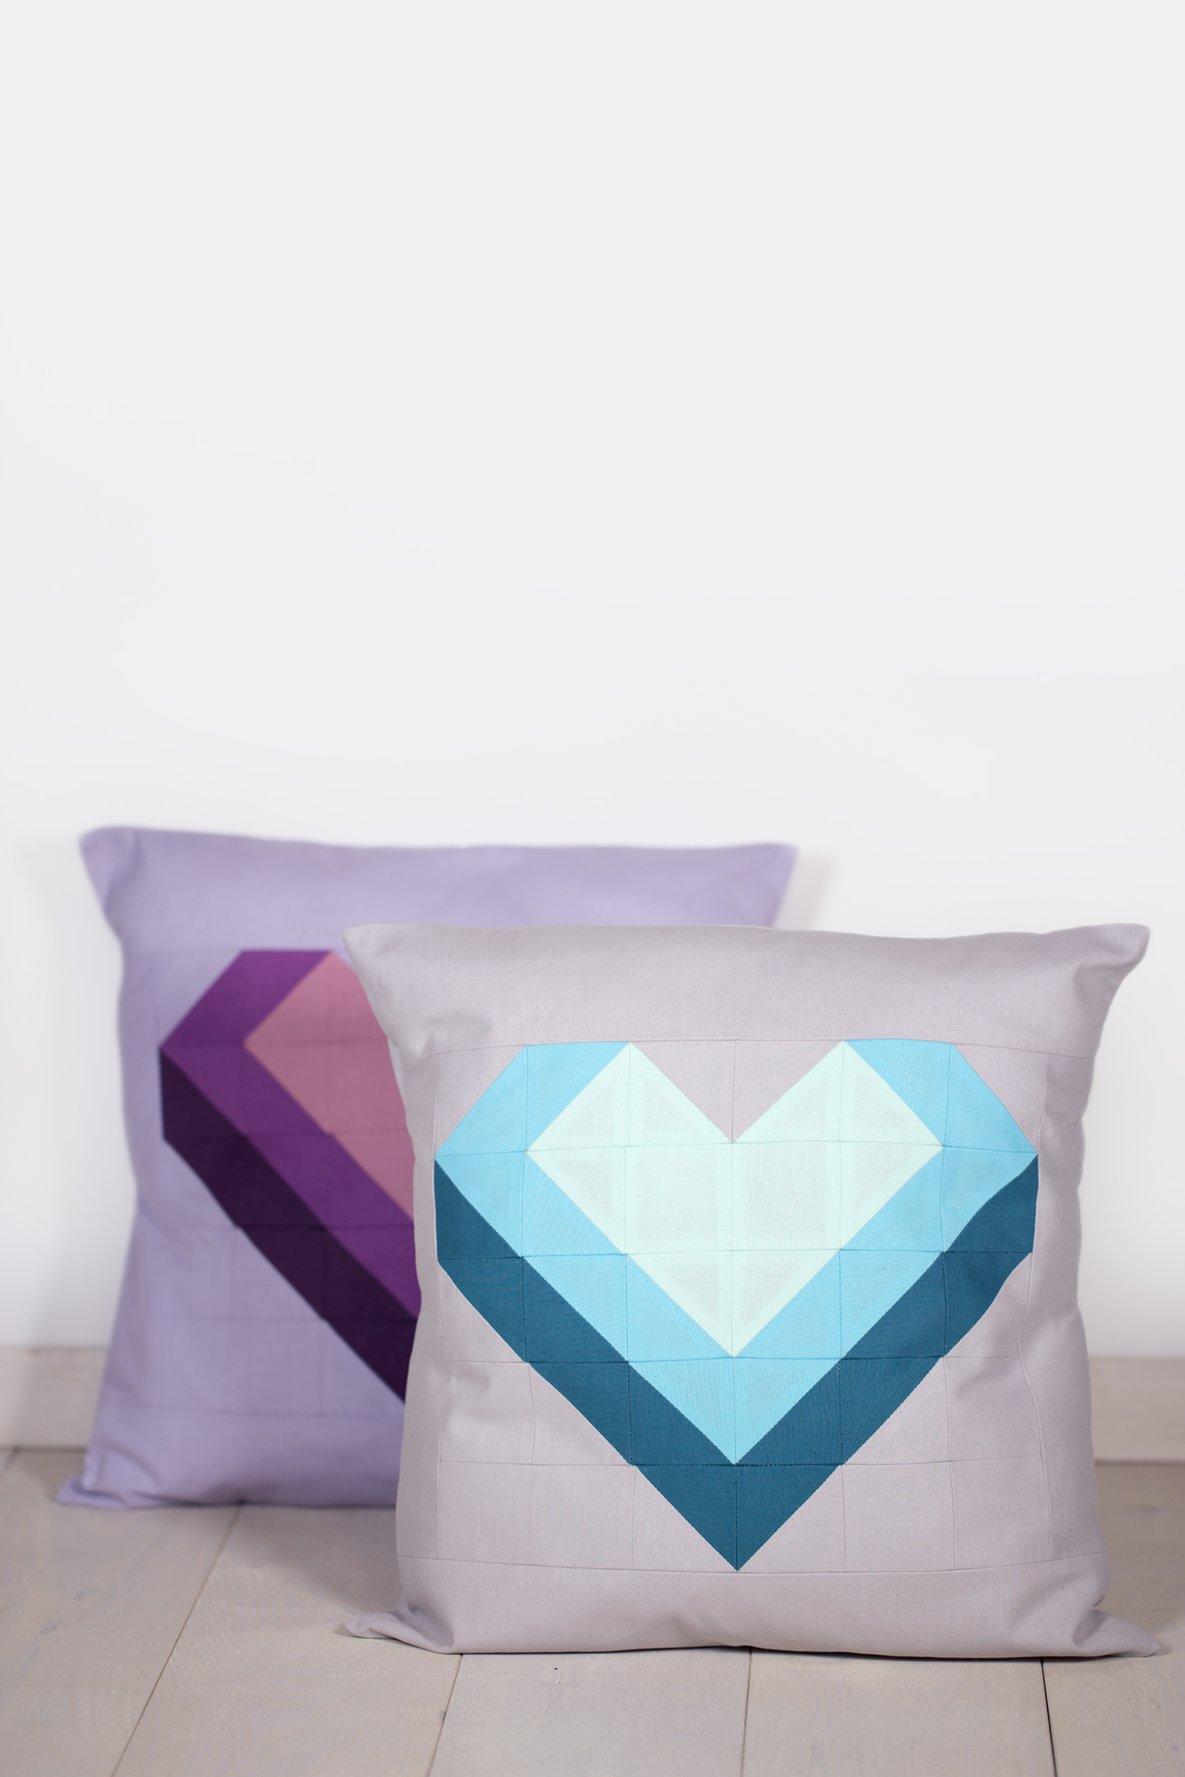 schnittmuster kissen patchwork herz. Black Bedroom Furniture Sets. Home Design Ideas